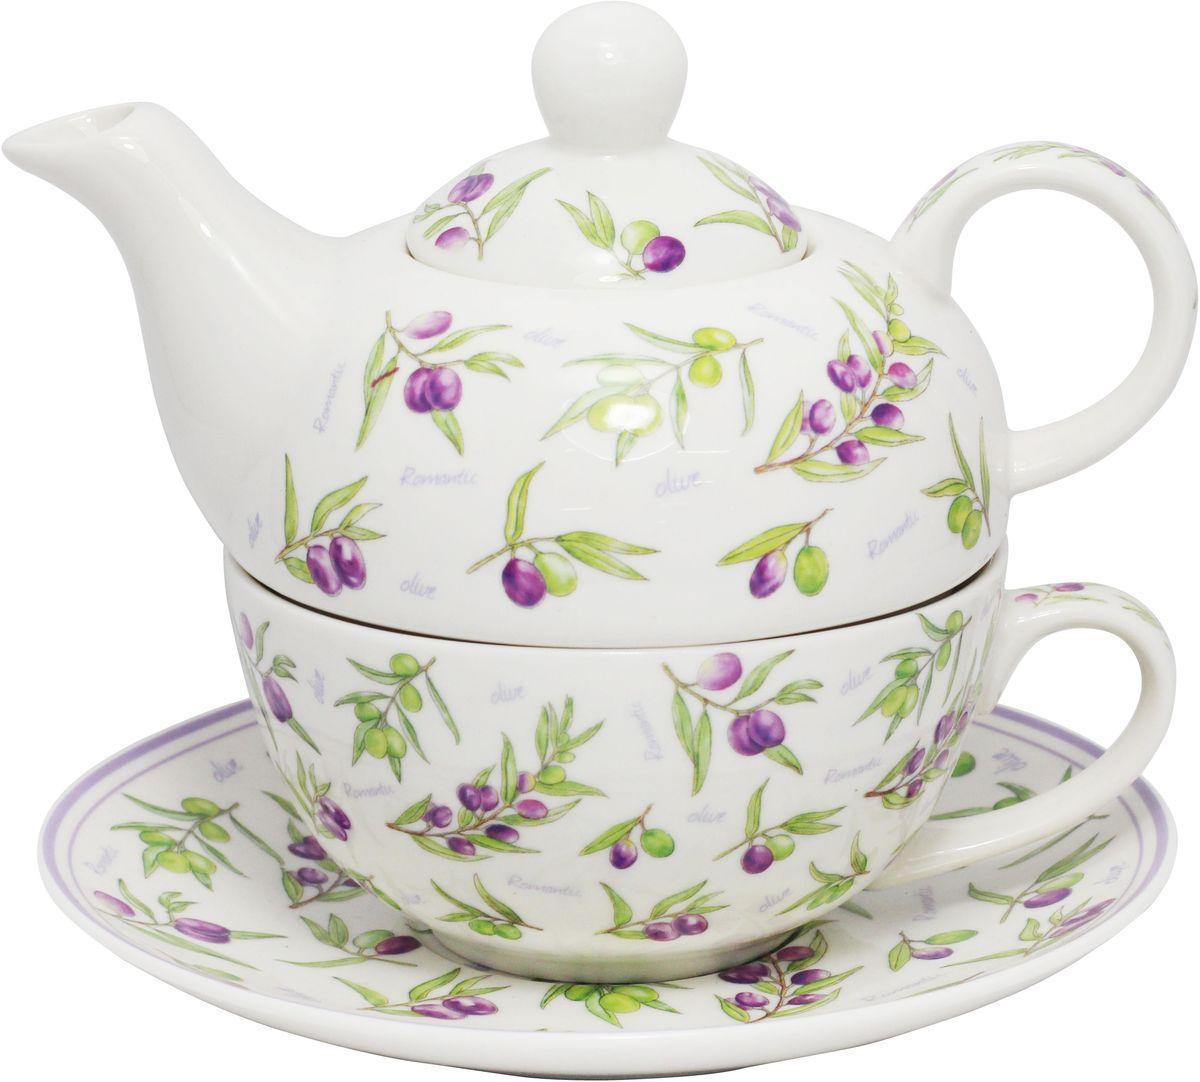 Набор чайный JEWEL Оливки, 3 предметаПКГО0005ПКГО0005 Чайник 400 мл,чашка 300 мл,блюдце 16,7 см Оливки